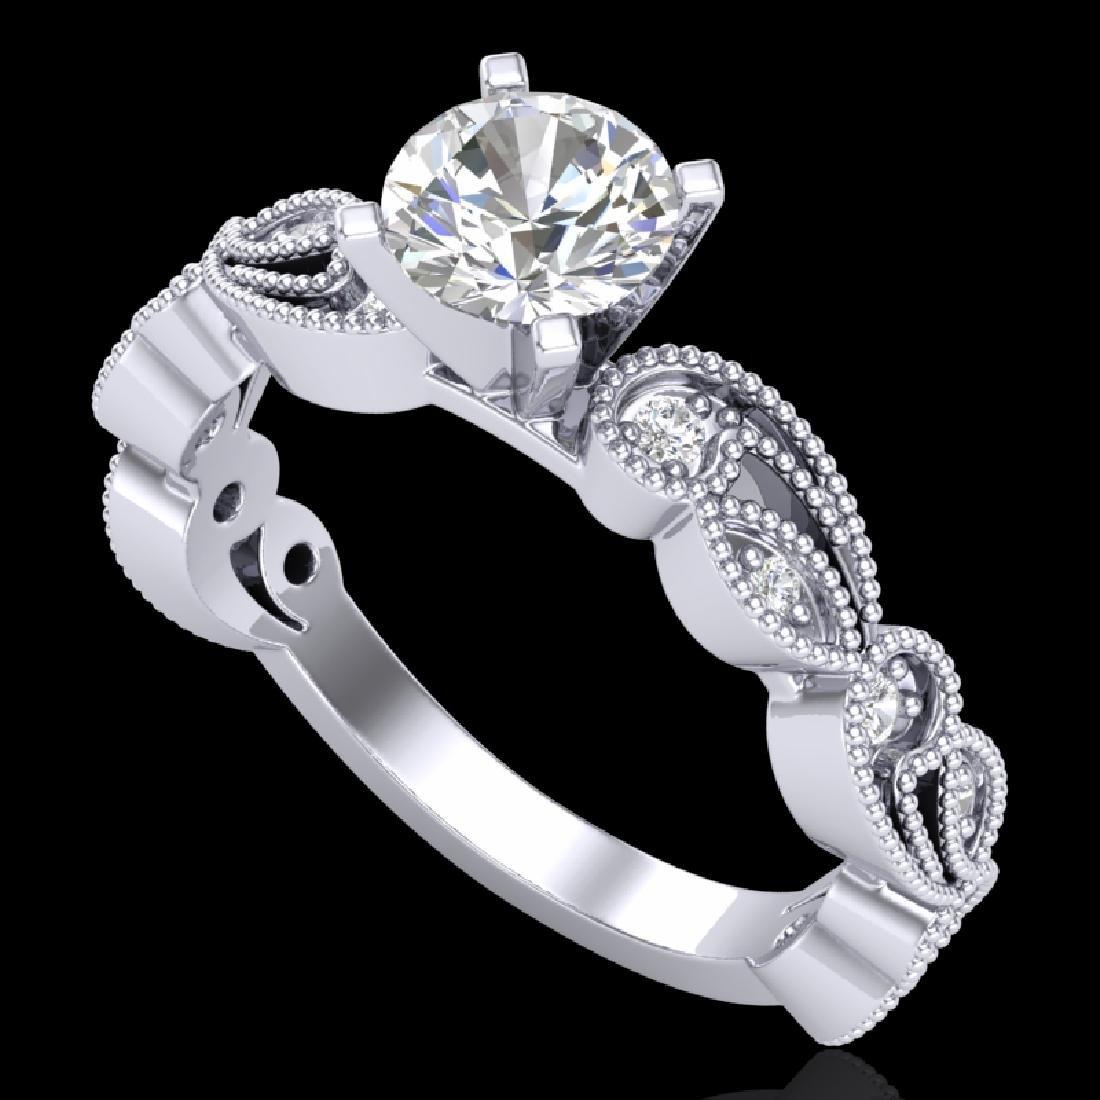 1.01 CTW VS/SI Diamond Solitaire Art Deco Ring 18K